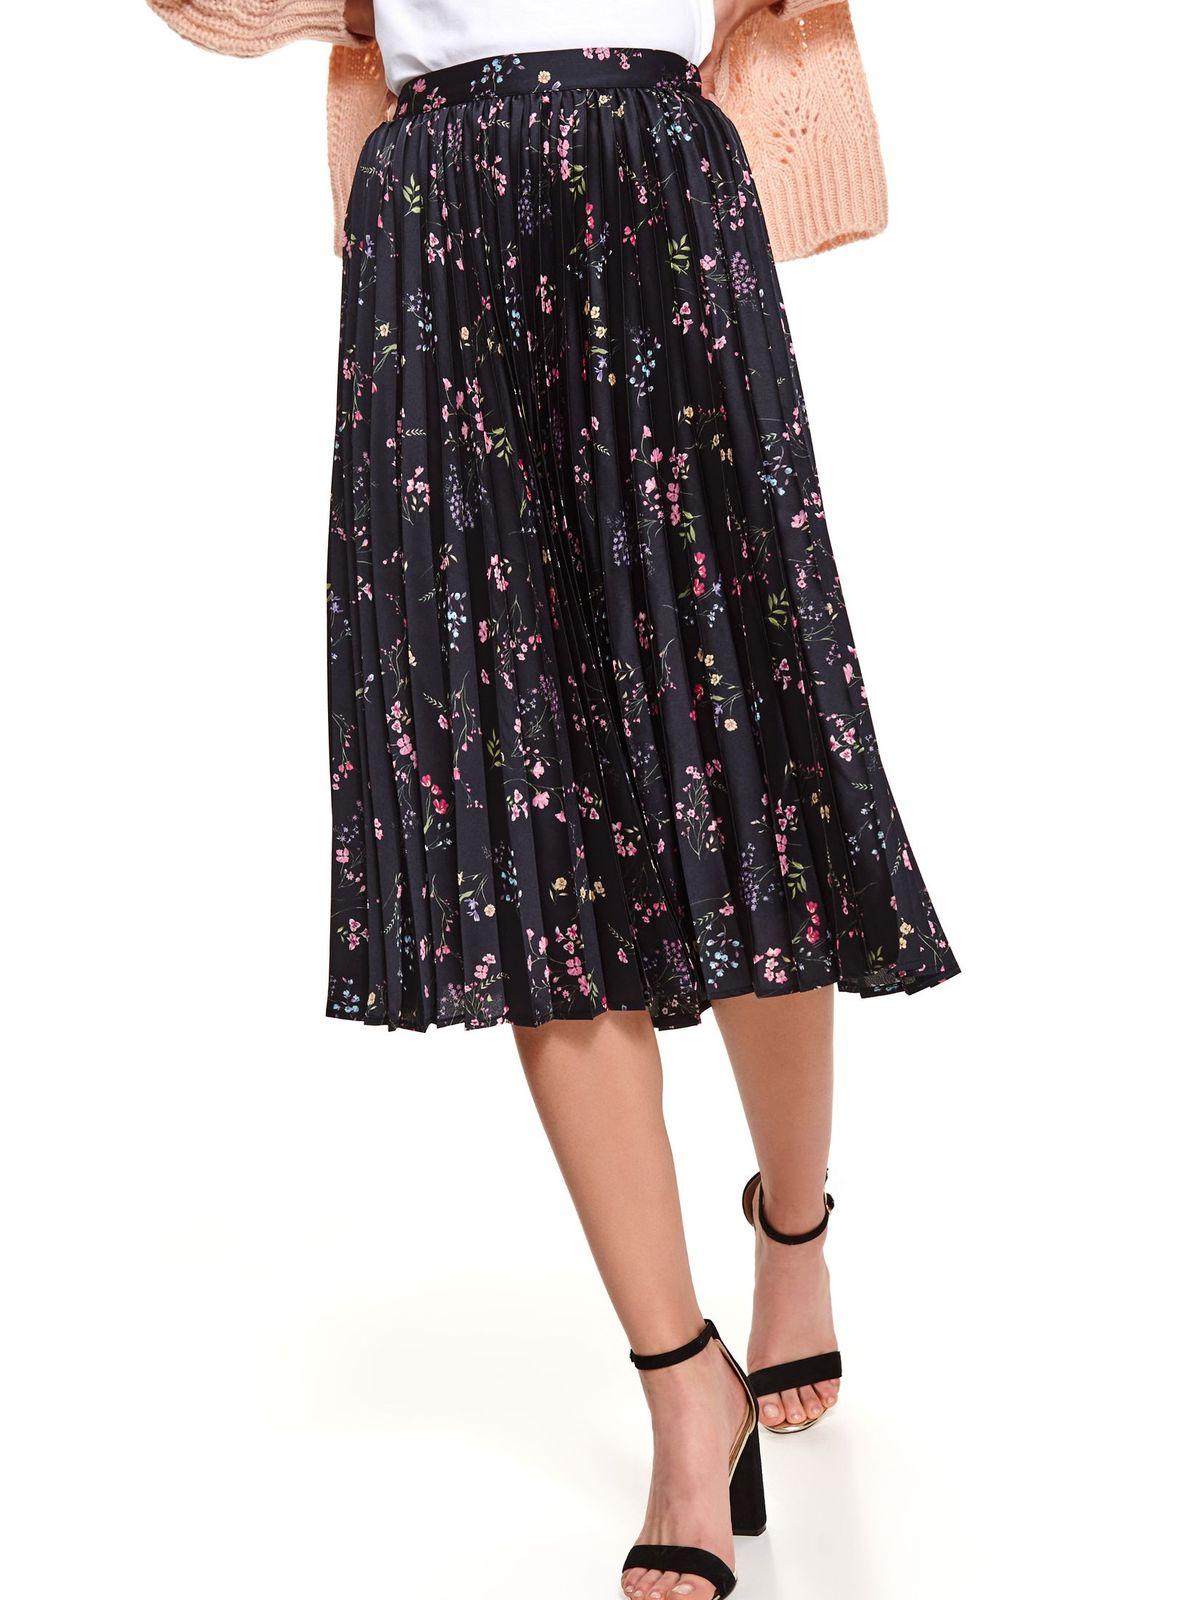 Black skirt midi cloche folded up high waisted